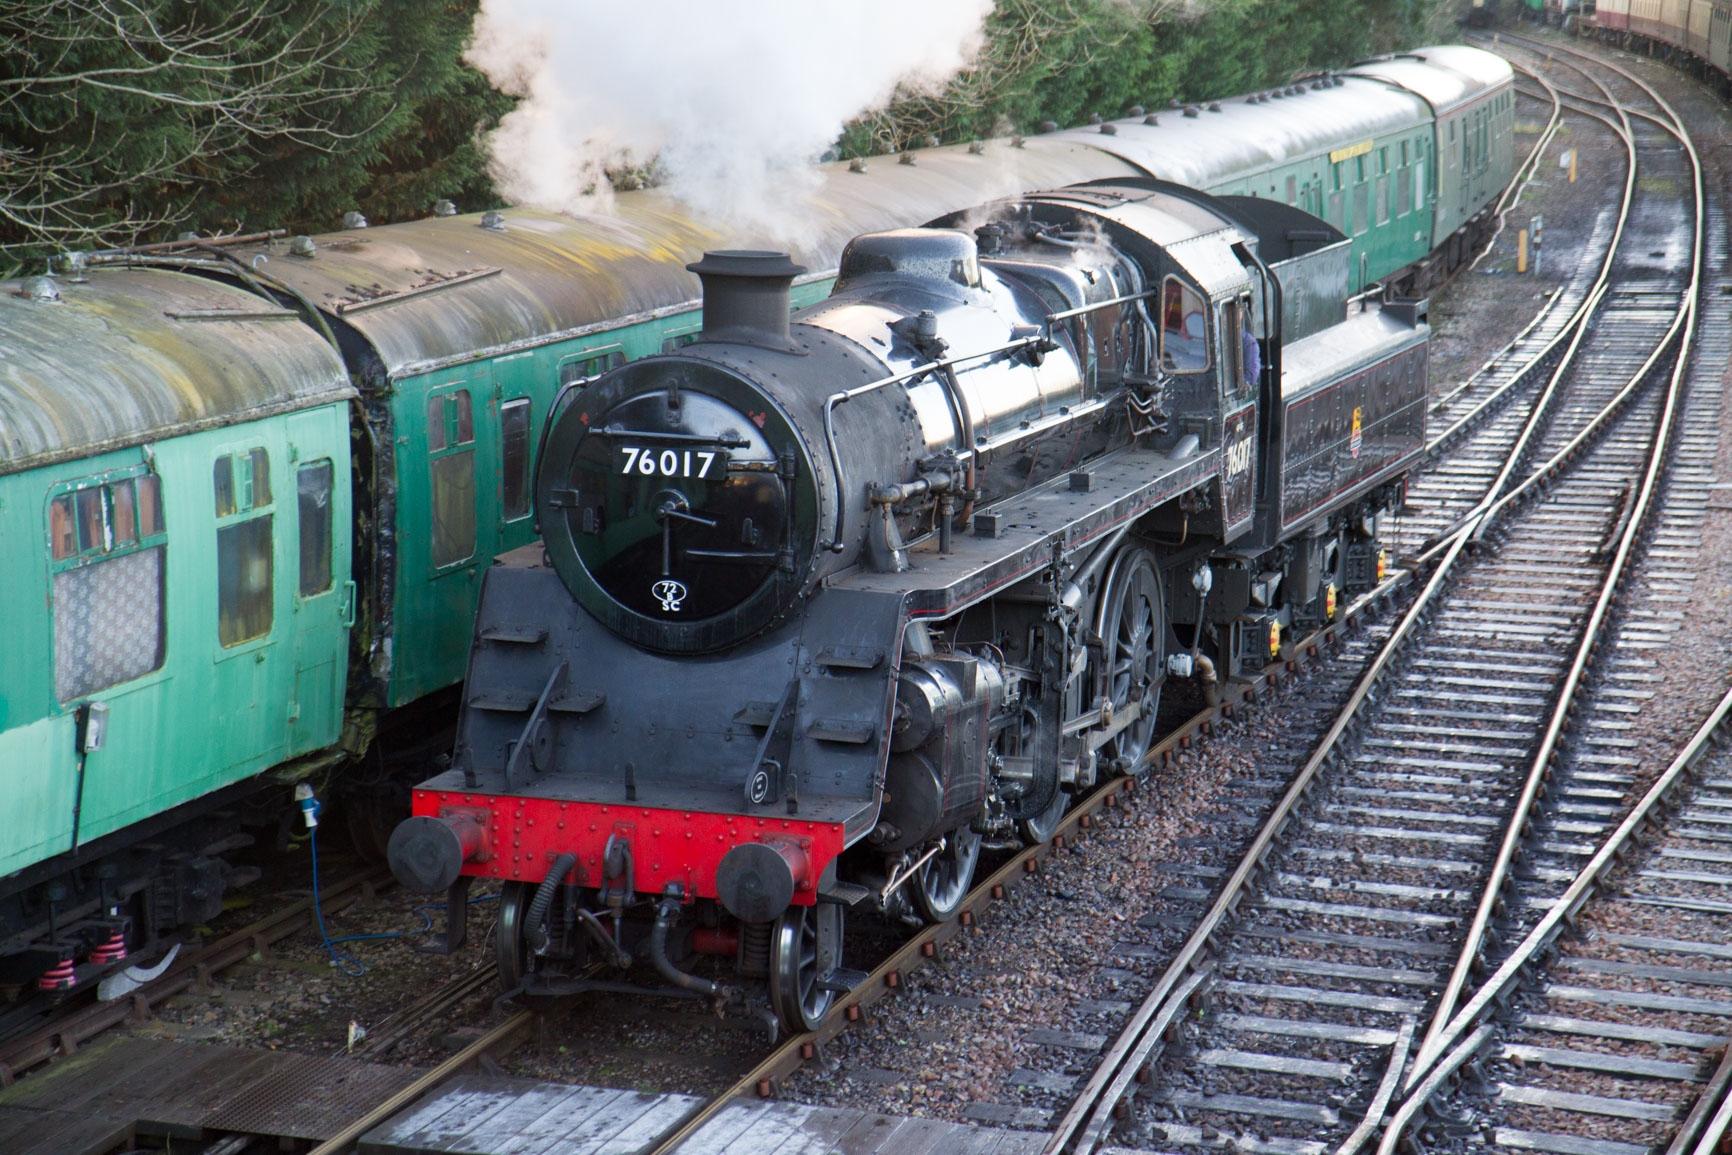 Watercress Line Steam Trains, Hampshire